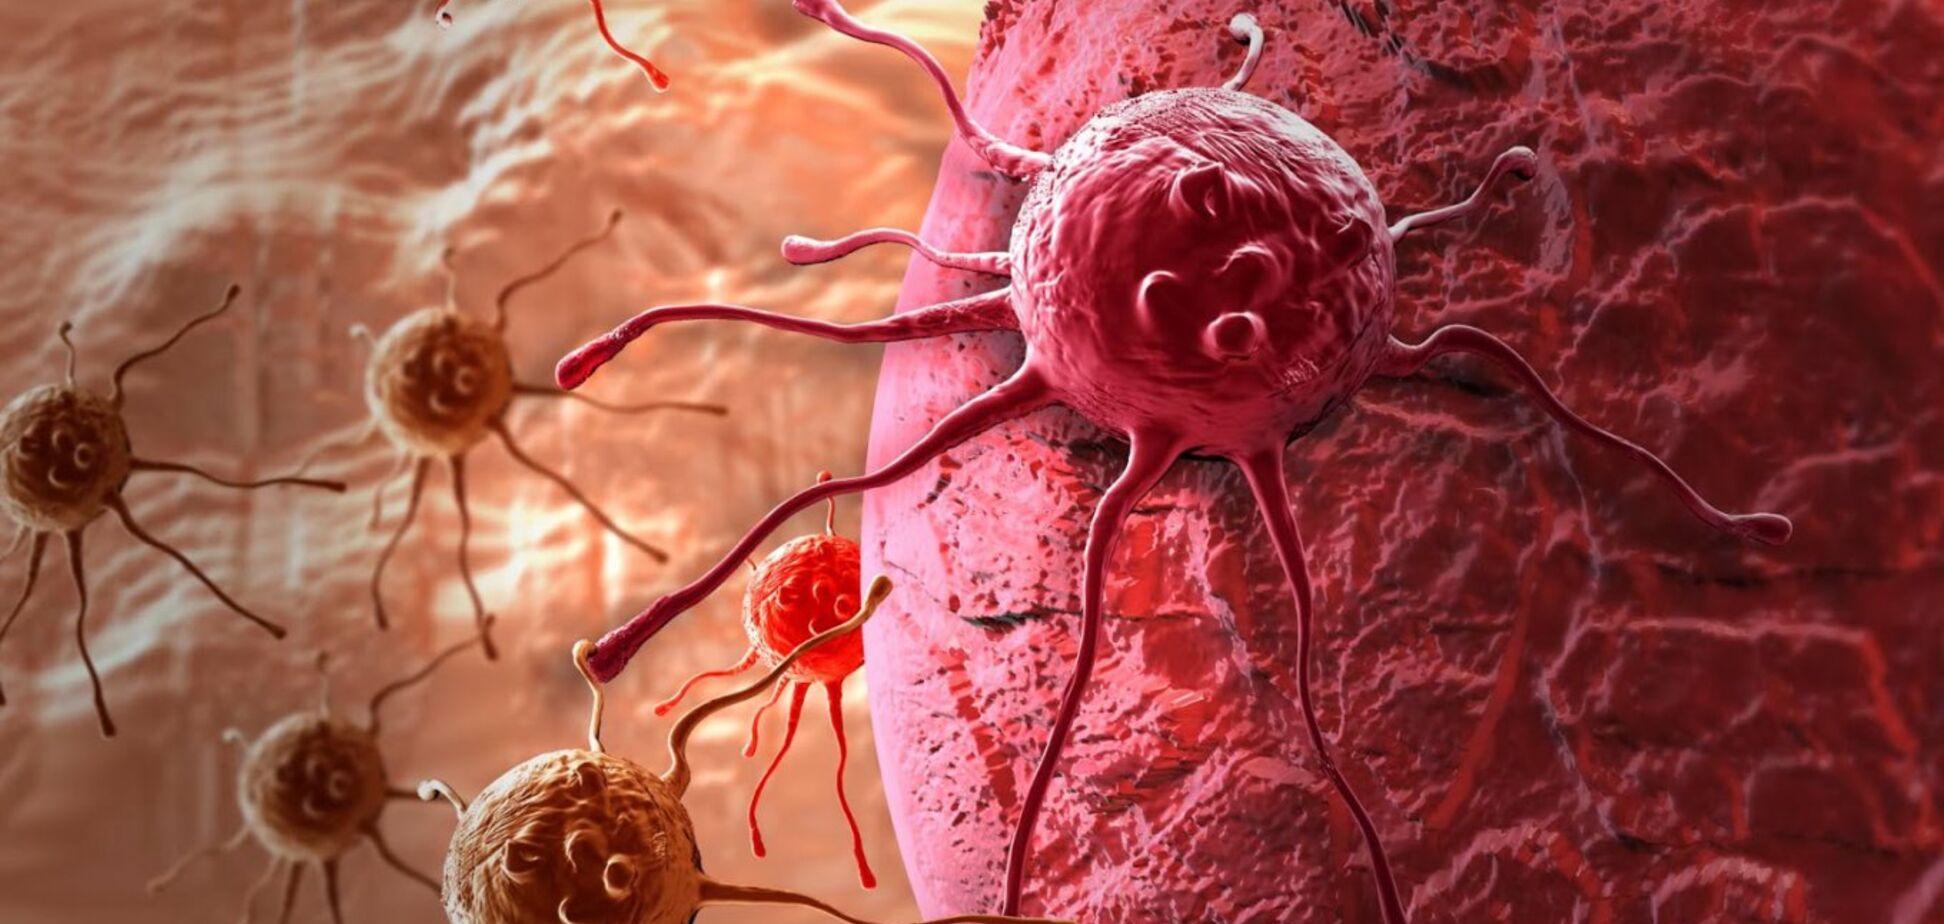 Ученые назвали фактор,повышающий риск смерти от рака на 82% (Фото: Naked Science)